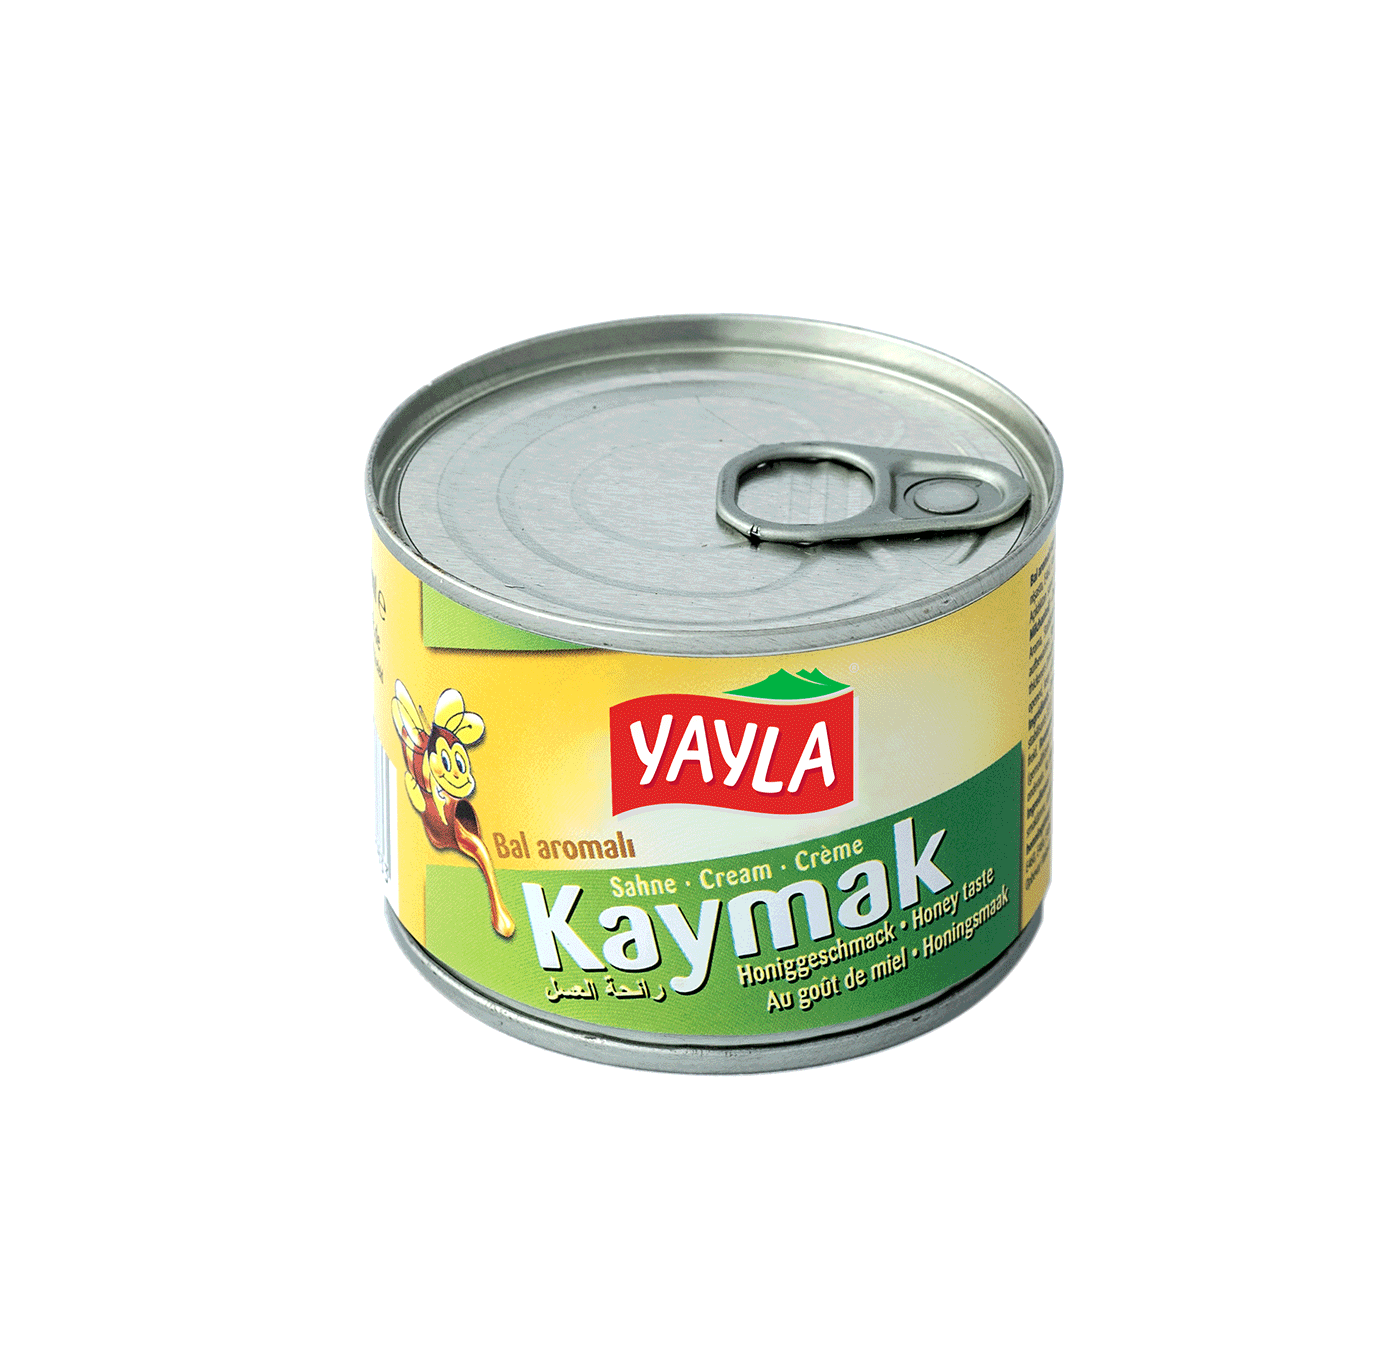 Yayla Balli Kaymak / Sahne mit Honiggeschmack 170g